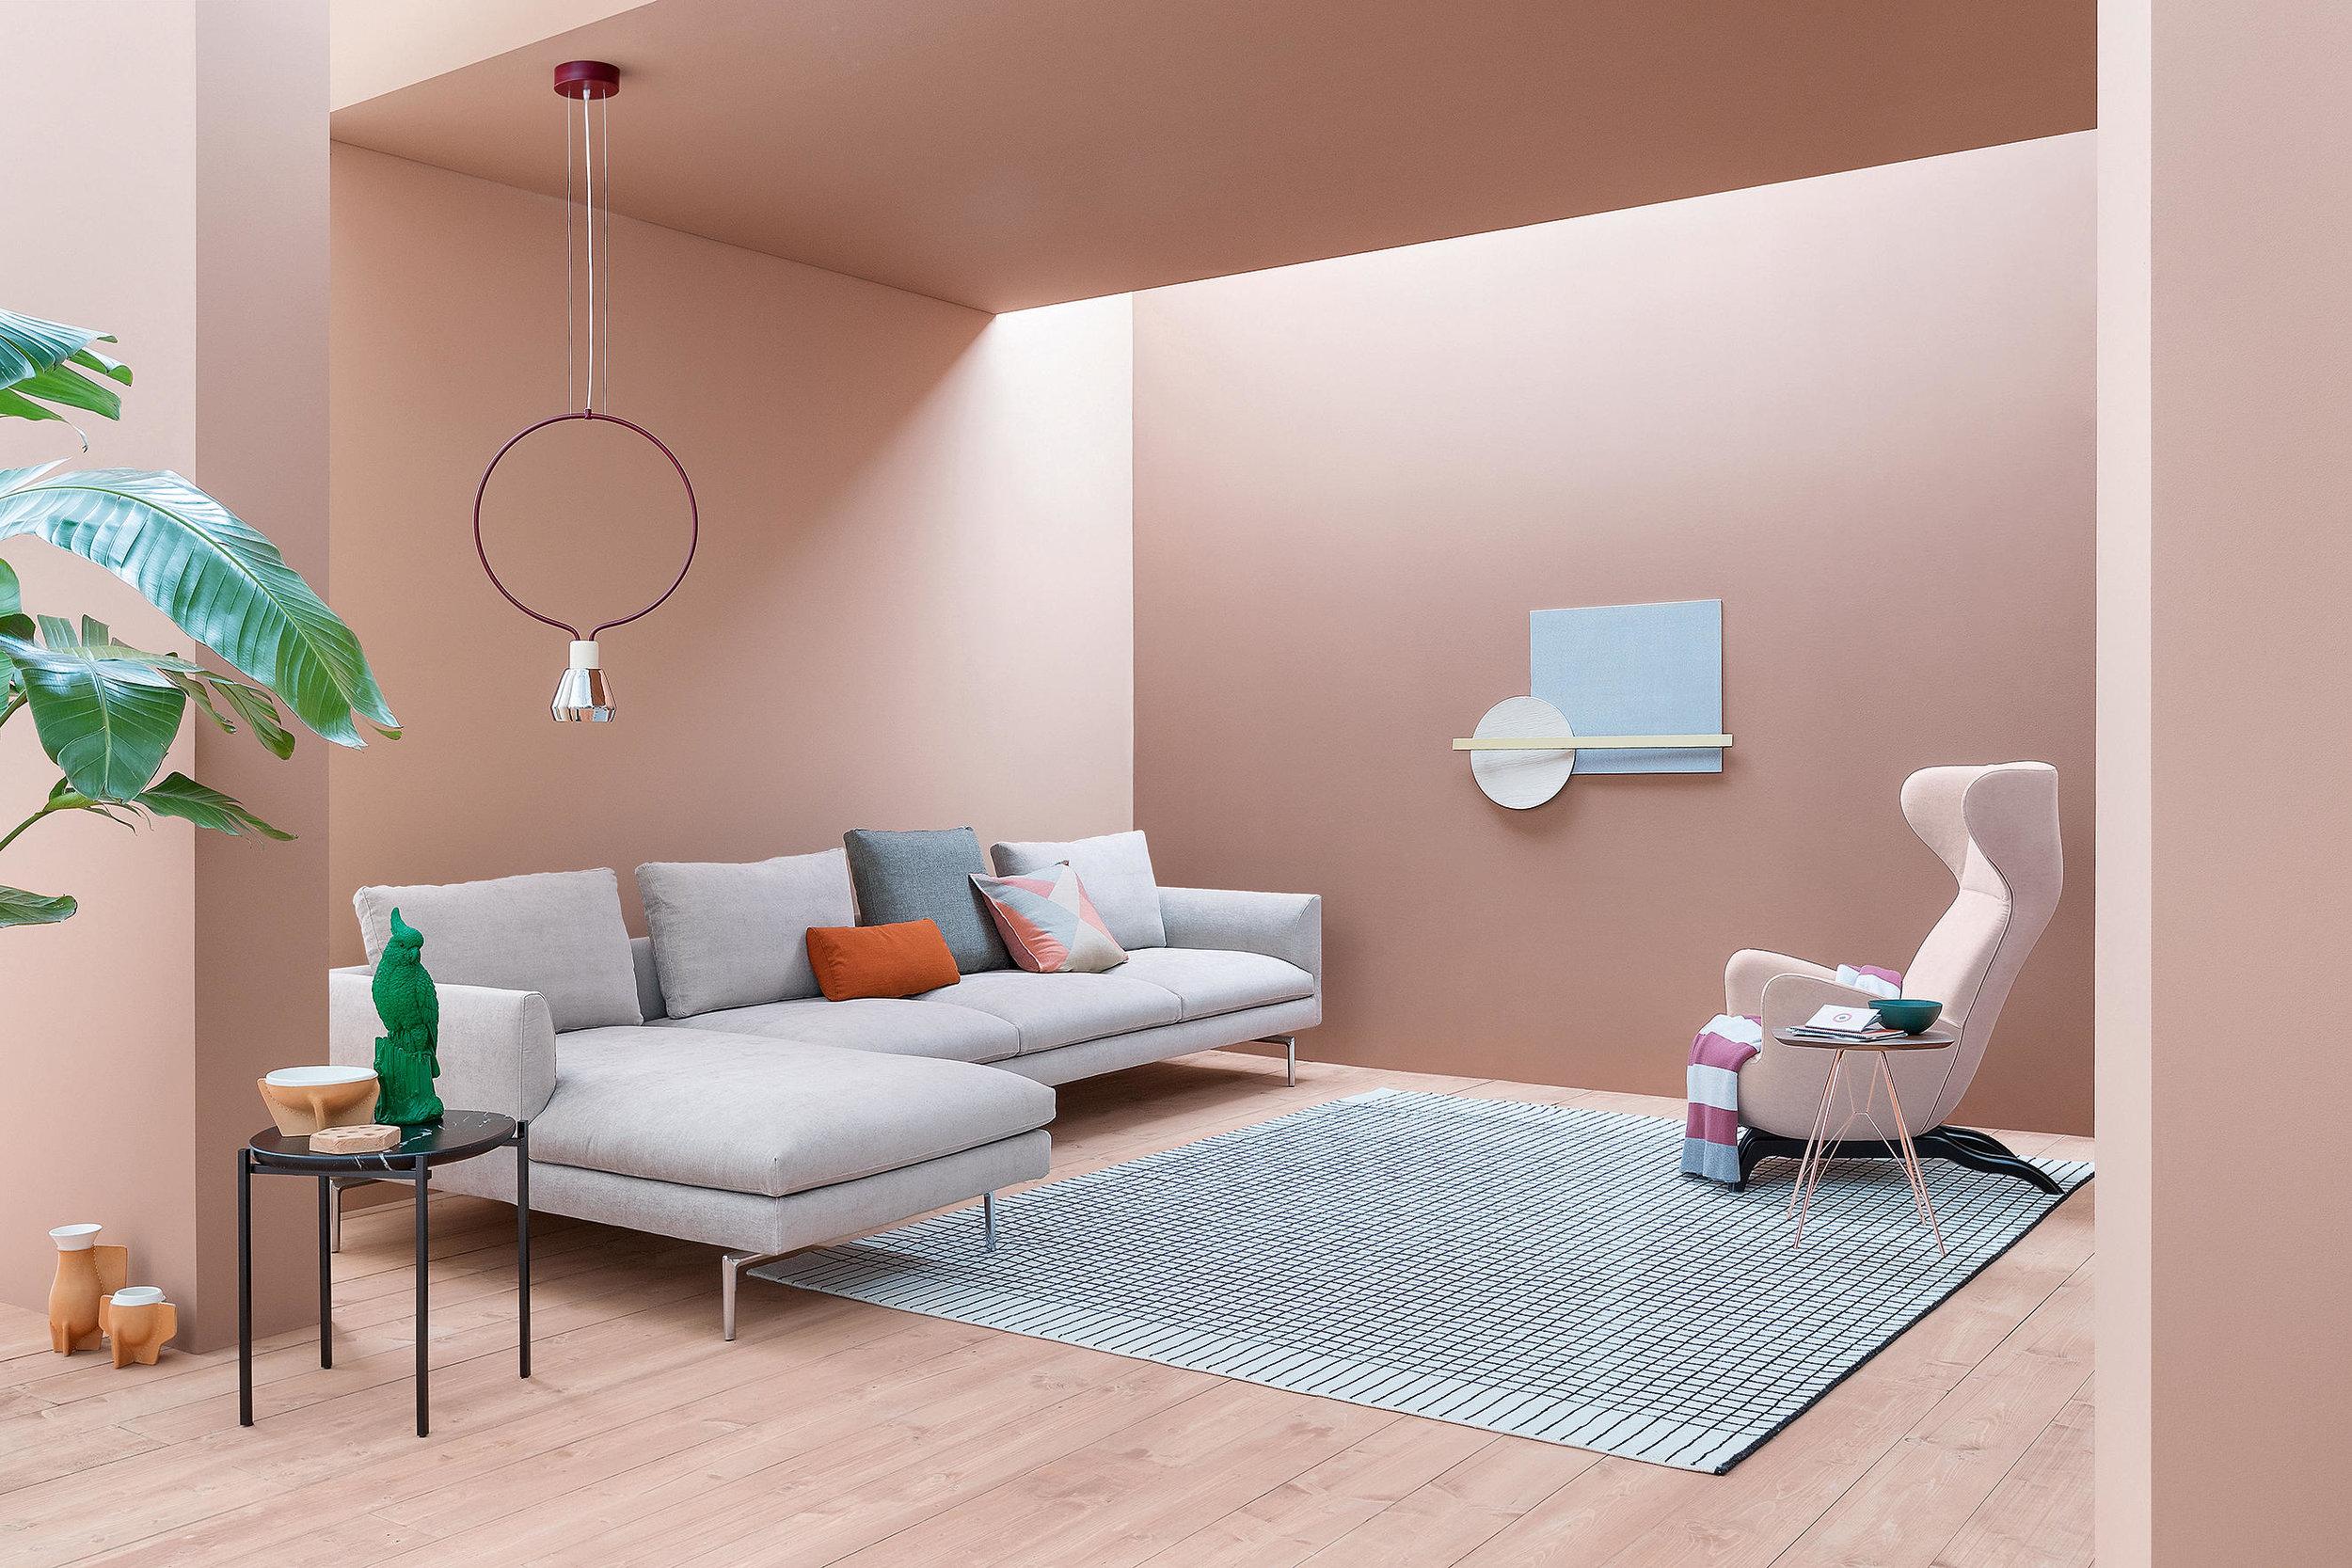 flamingo-5-b.jpg